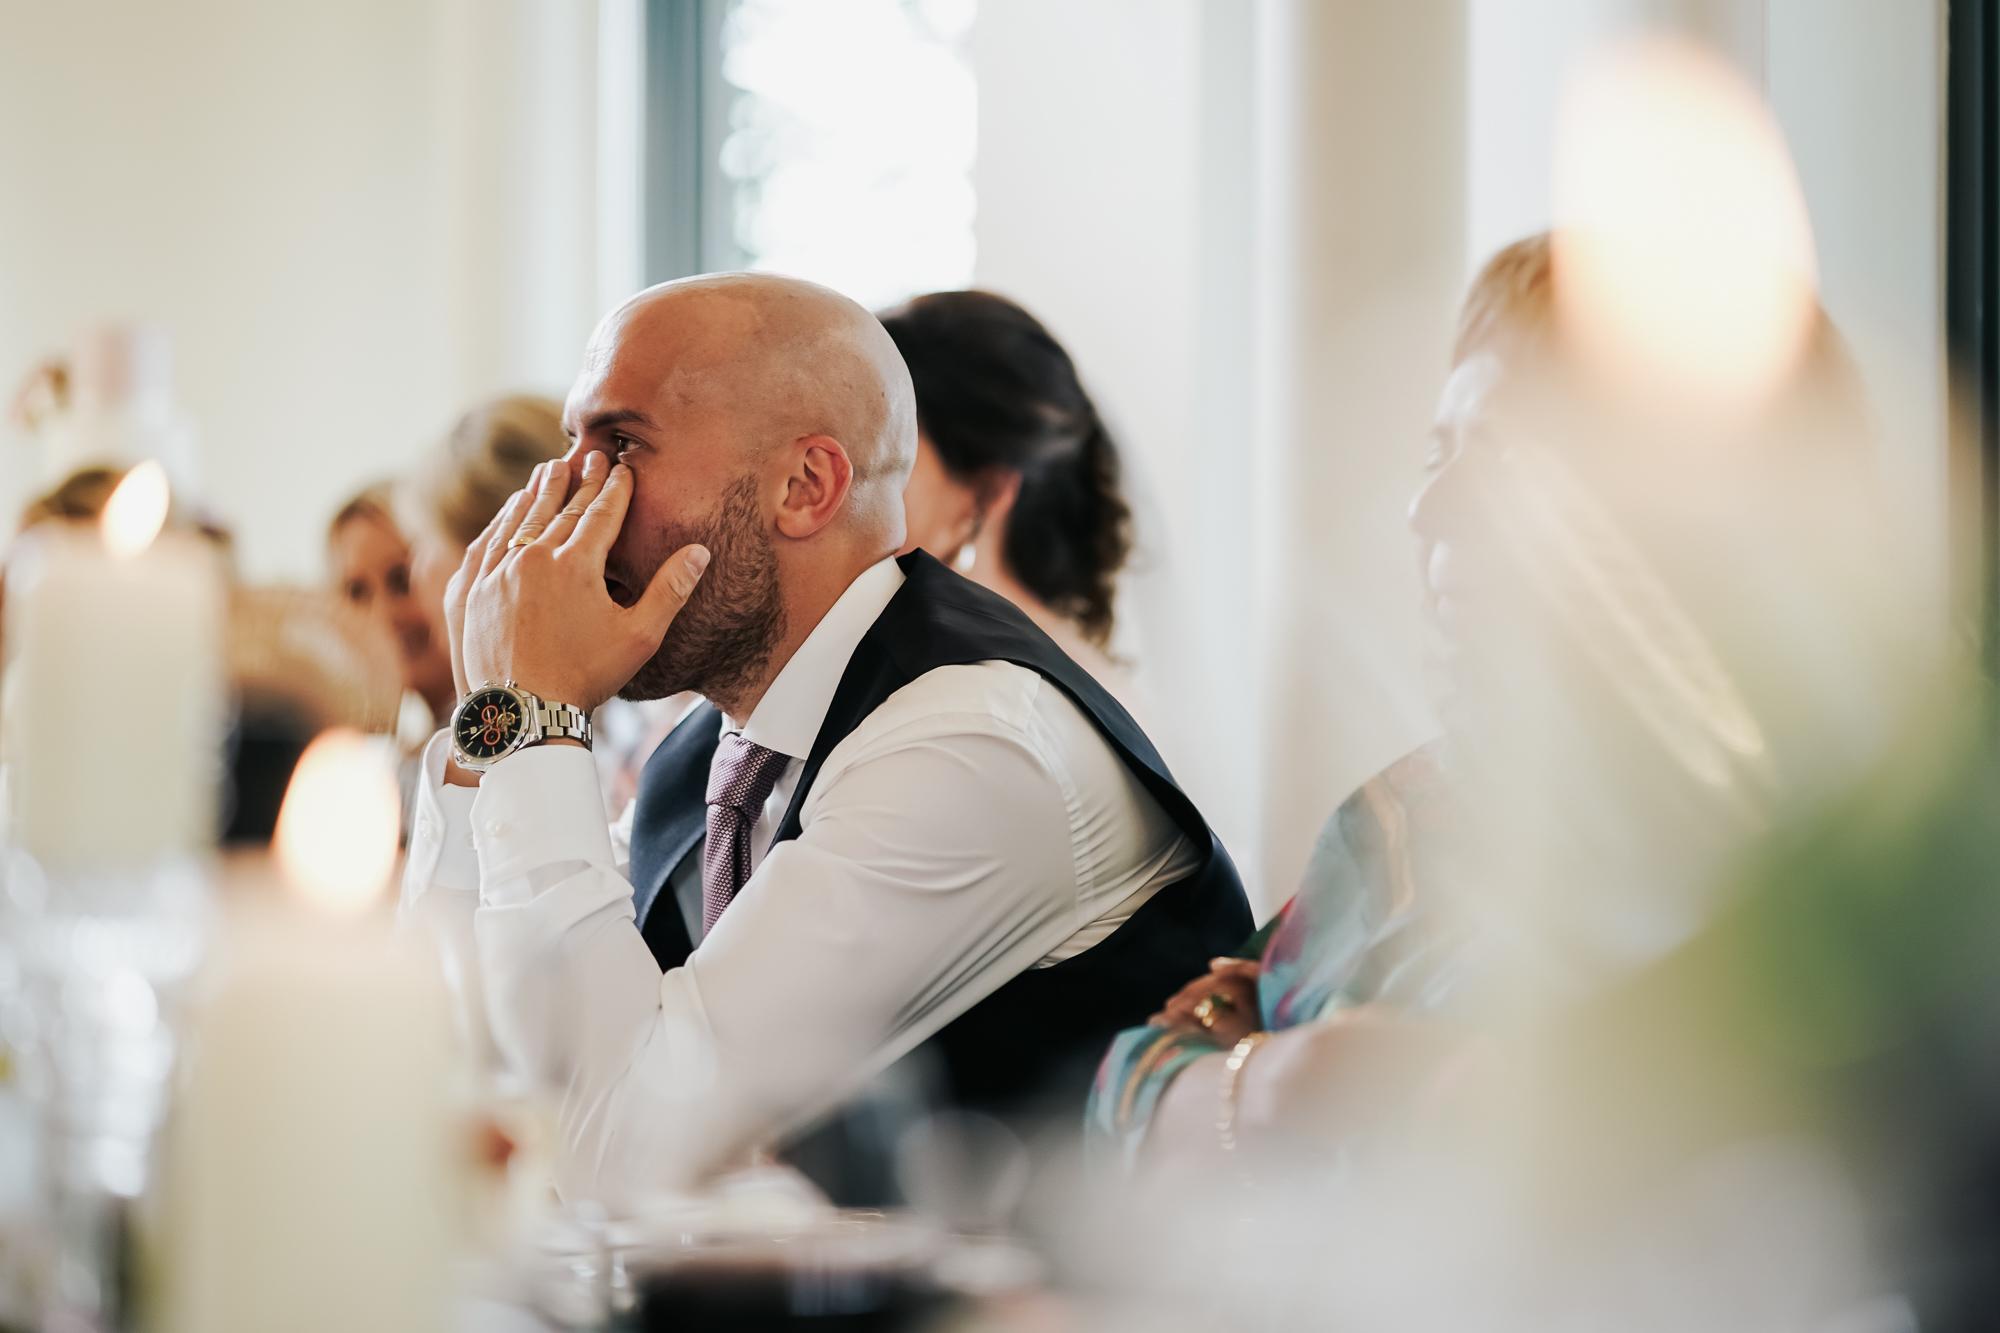 West Tower Wedding Venue Orkskirk Lancashire Wedding Photography cheshire wedding photographer (38 of 47).jpg